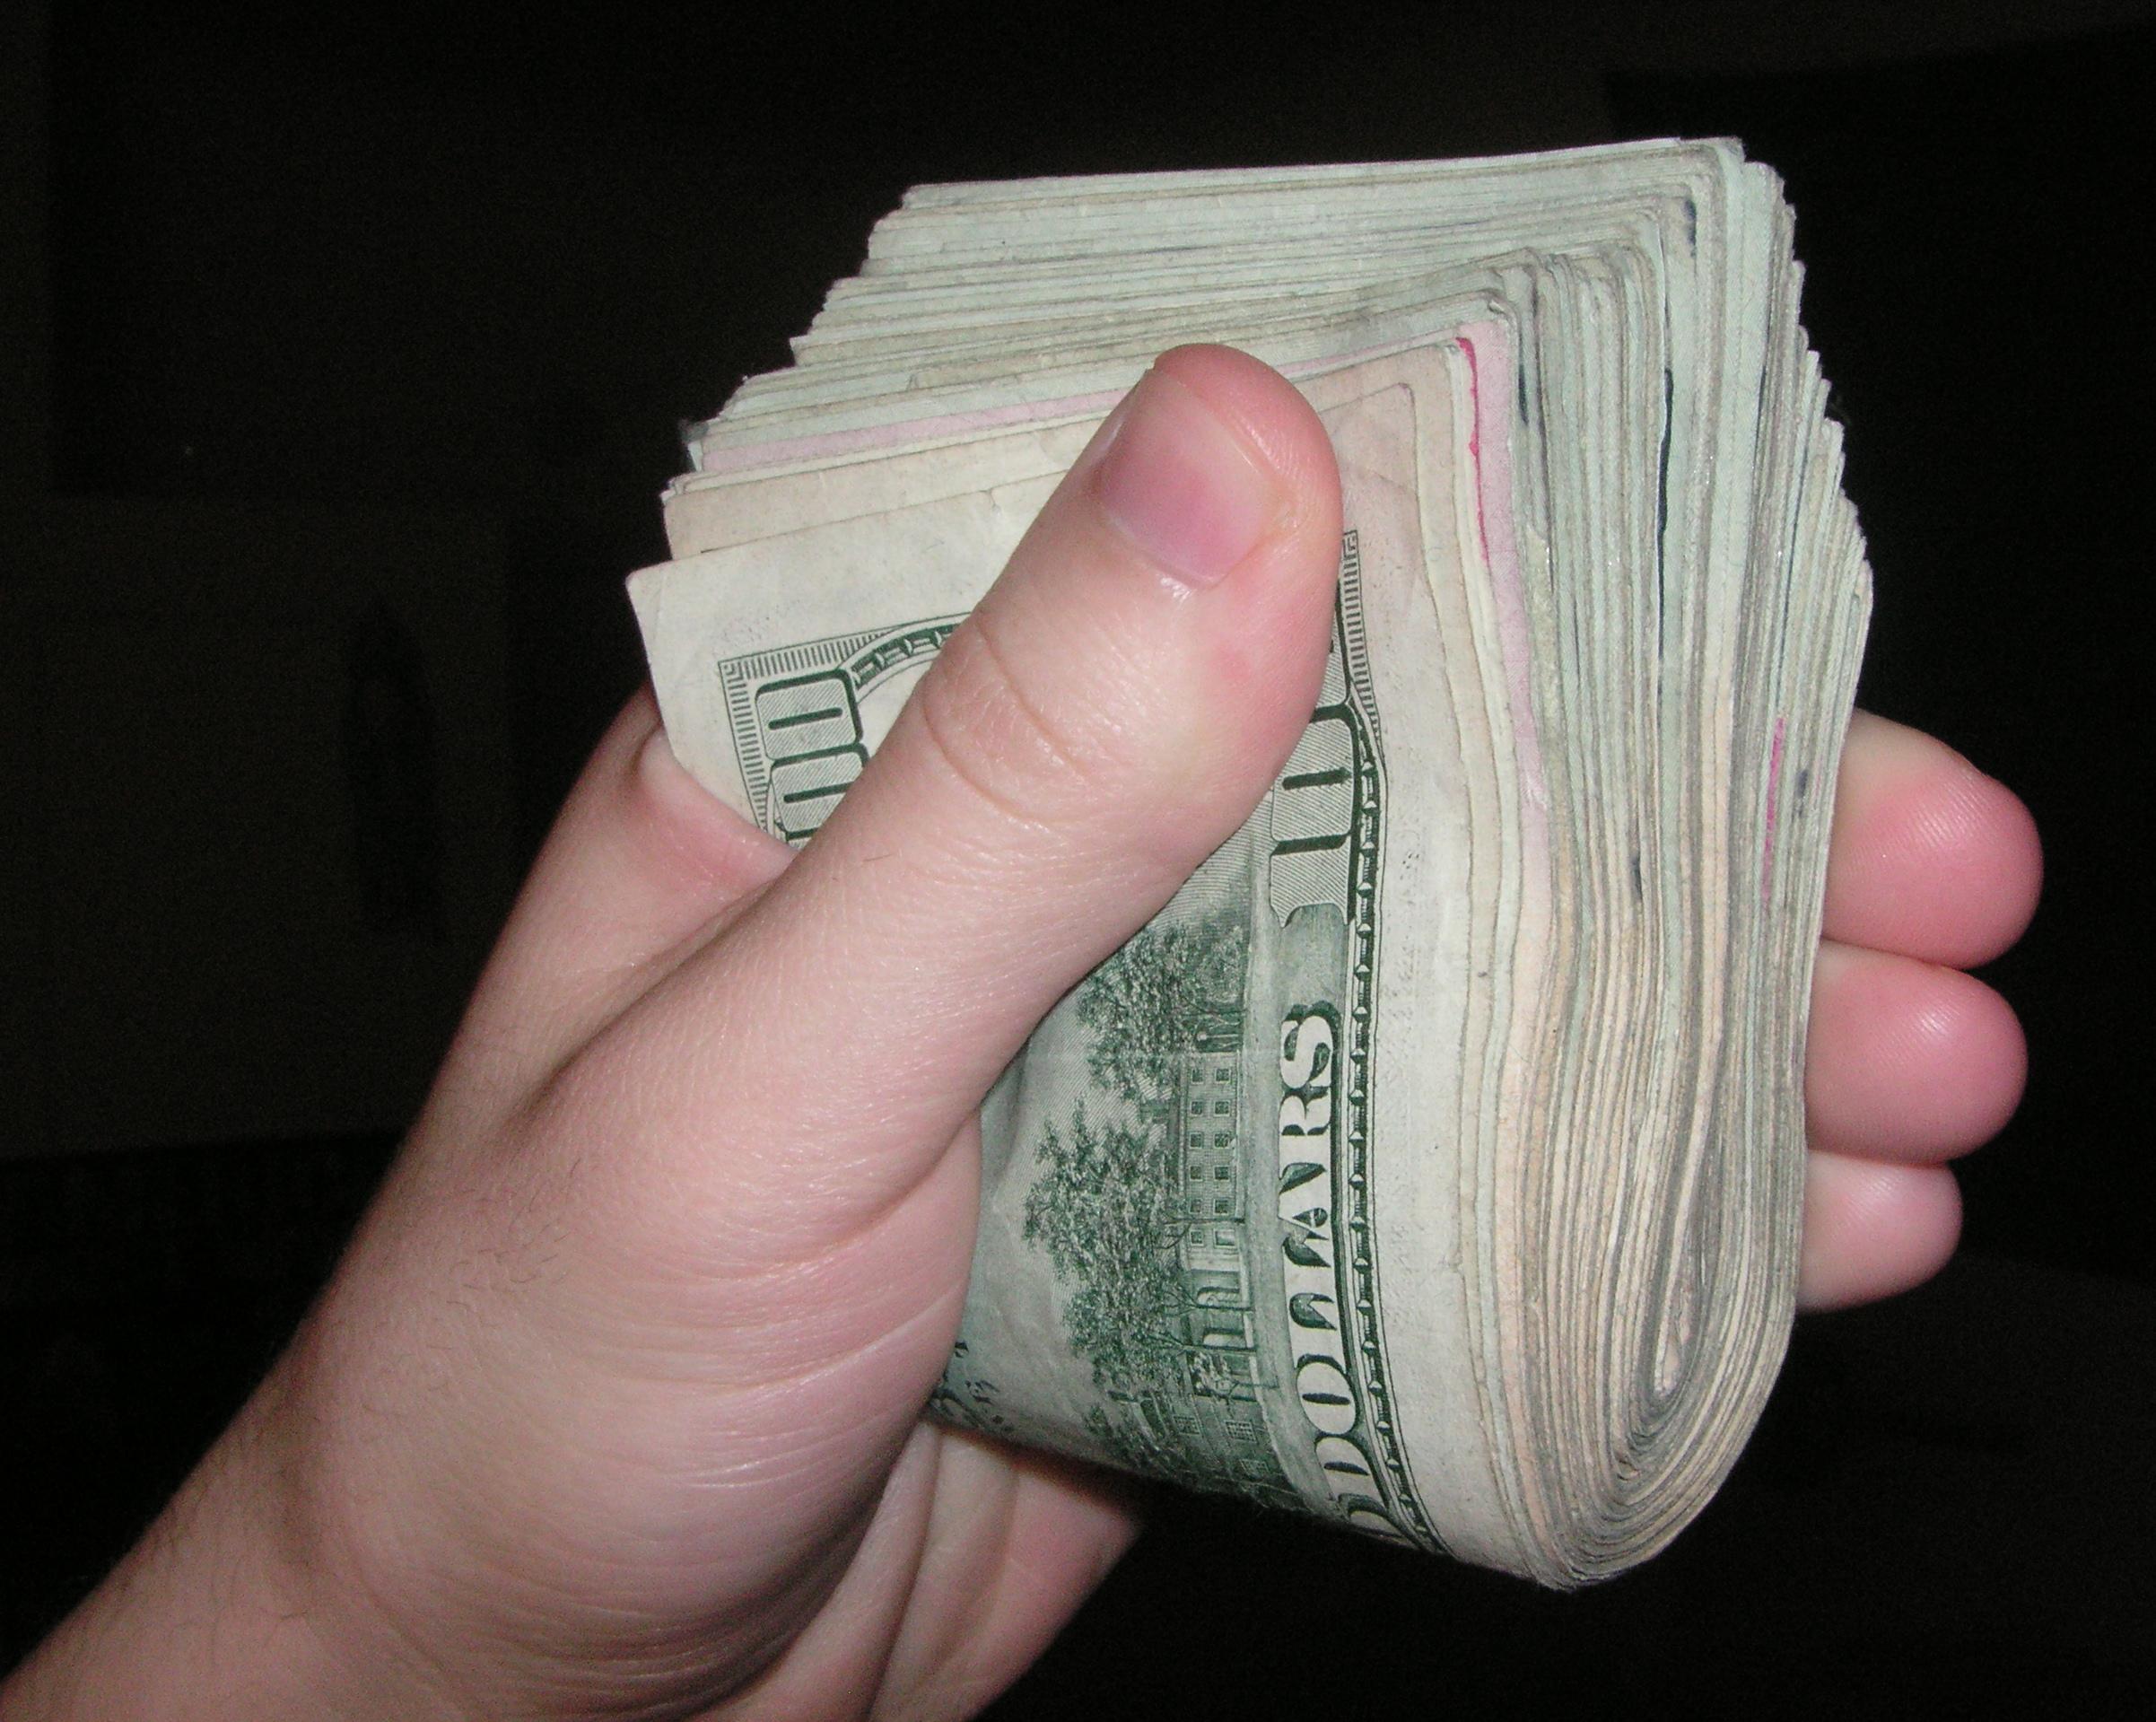 https://i0.wp.com/upload.wikimedia.org/wikipedia/commons/d/d9/American_Cash.JPG